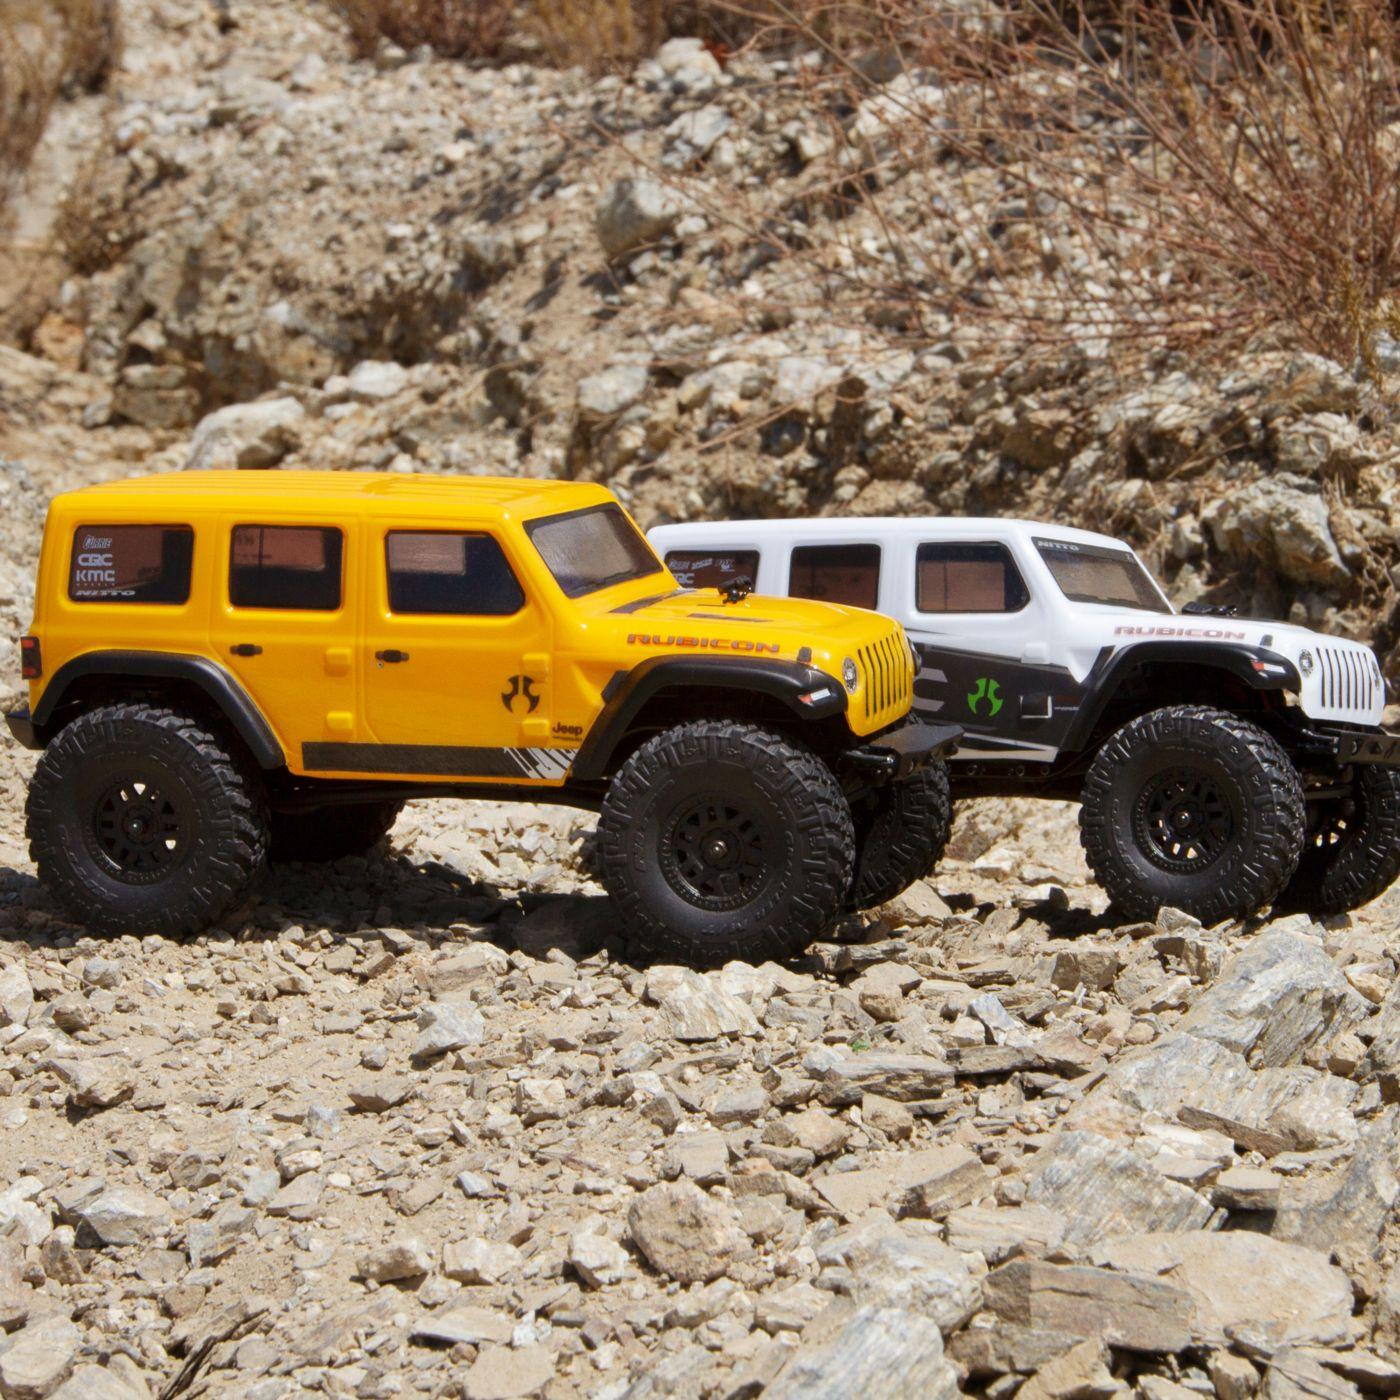 Axial 1/24 SCX24 2019 Jeep Wrangler JLU CRC Rock Crawler